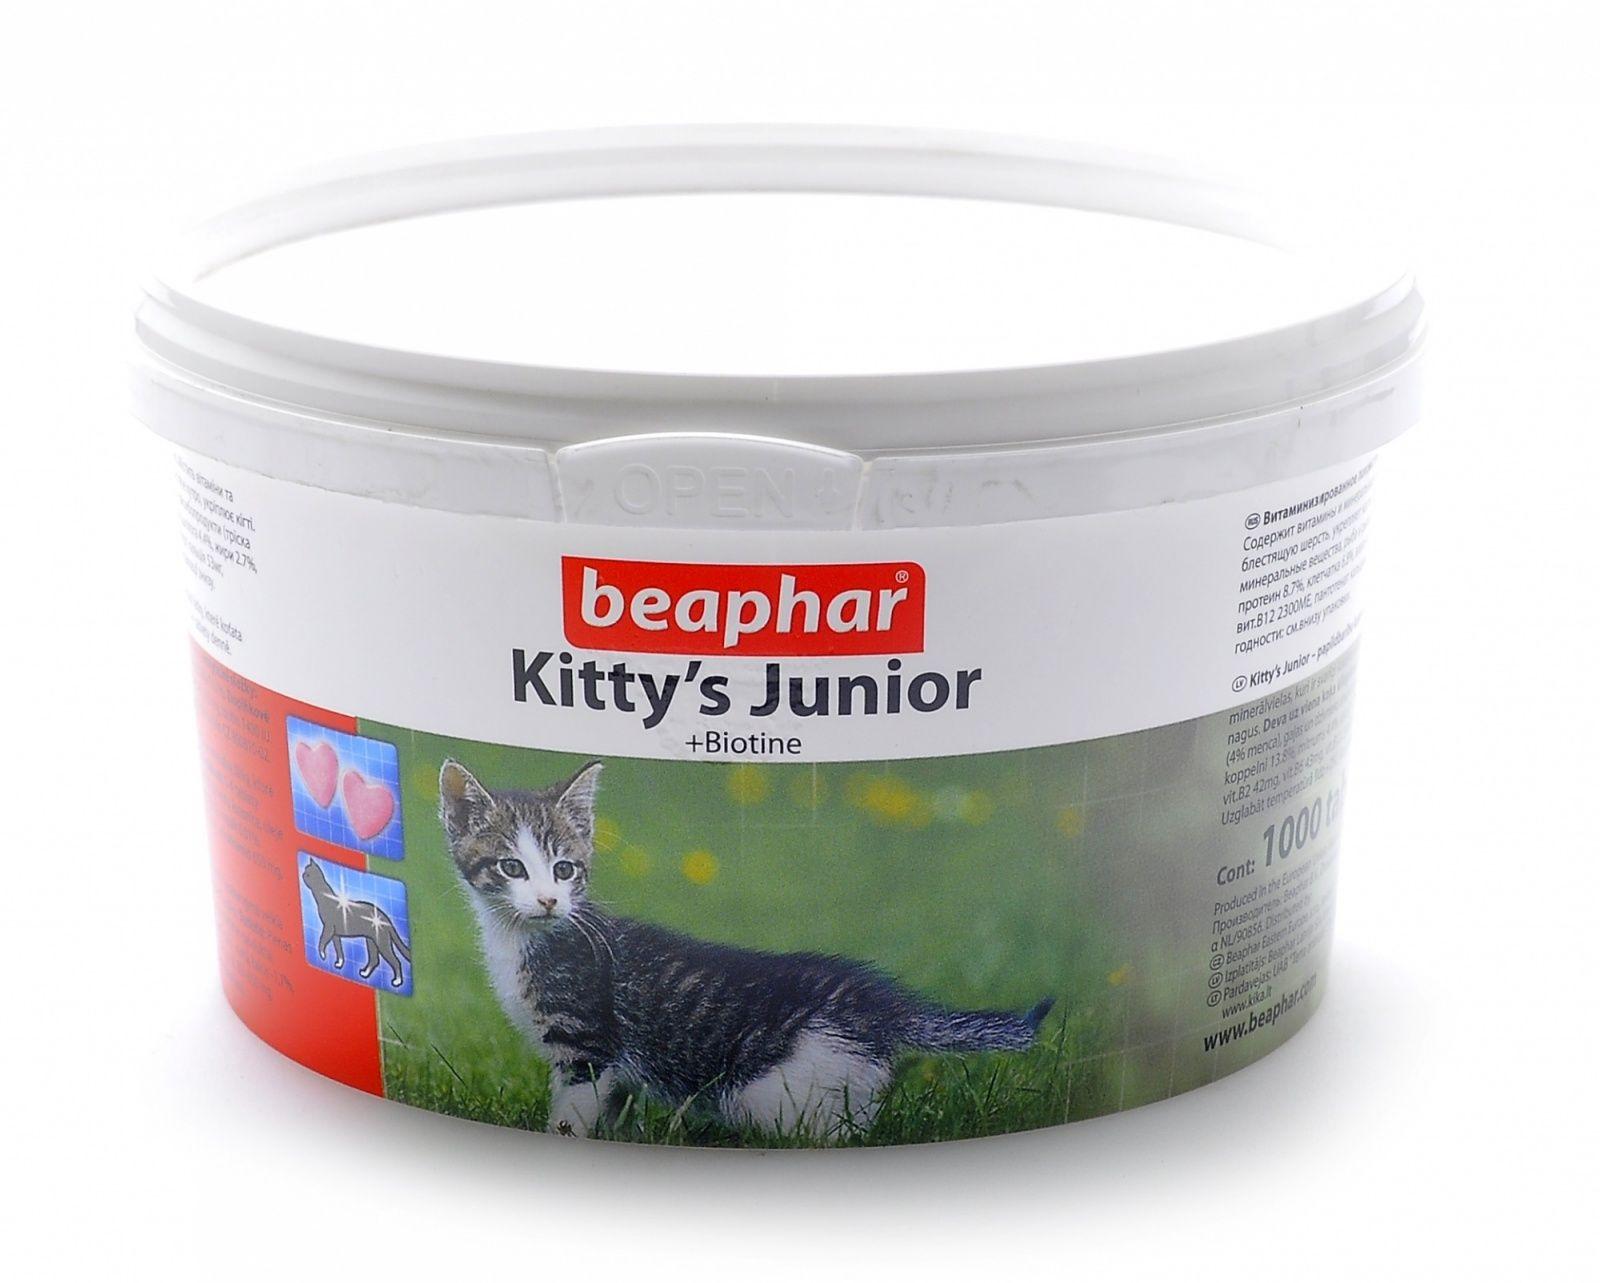 Beaphar Витамины для котят Kitty's Junior, 1000шт. от Ravta